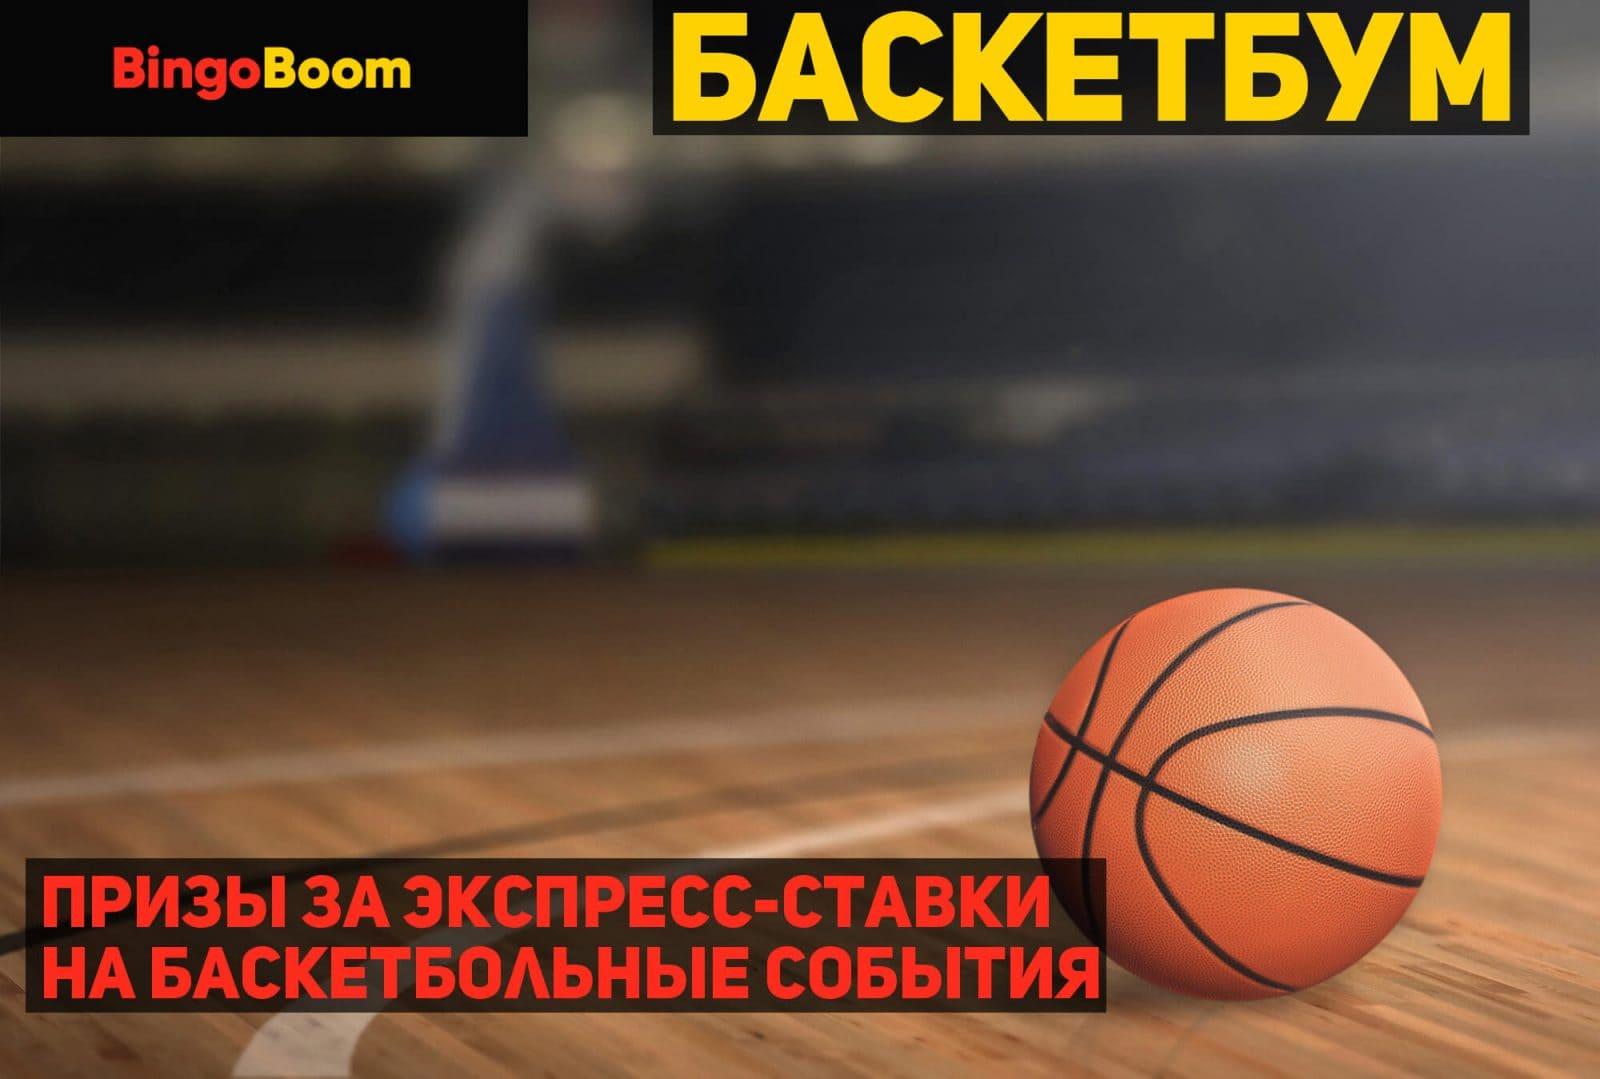 Баскетбум